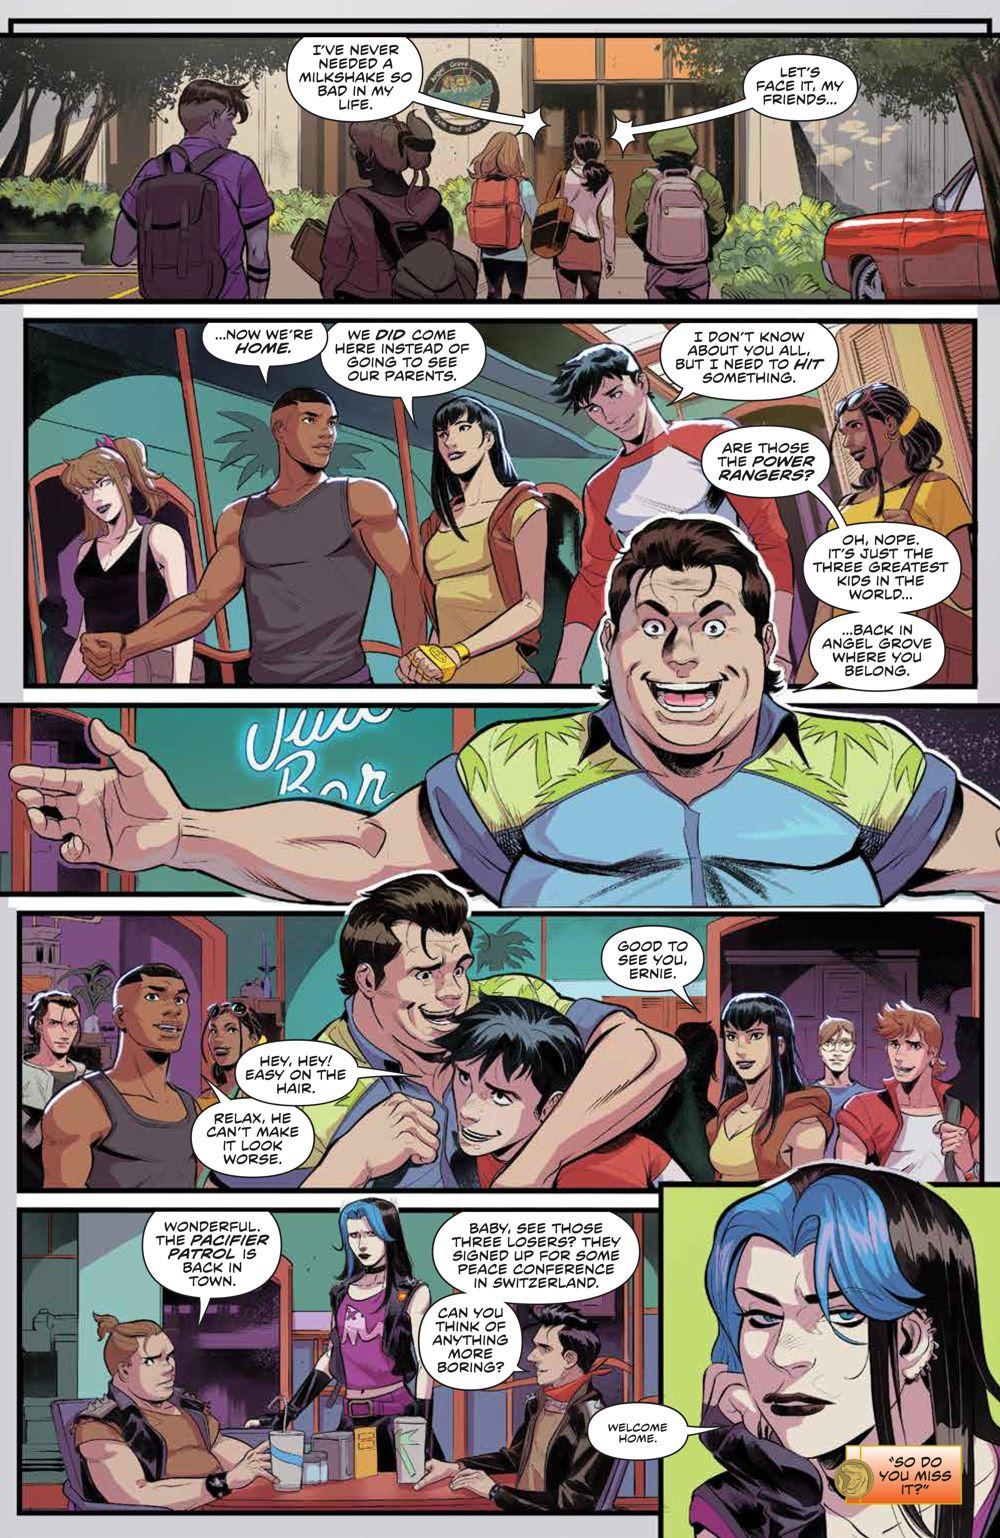 PowerRangers_v1_SC_PRESS_18 ComicList Previews: POWER RANGERS VOLUME 1 TP